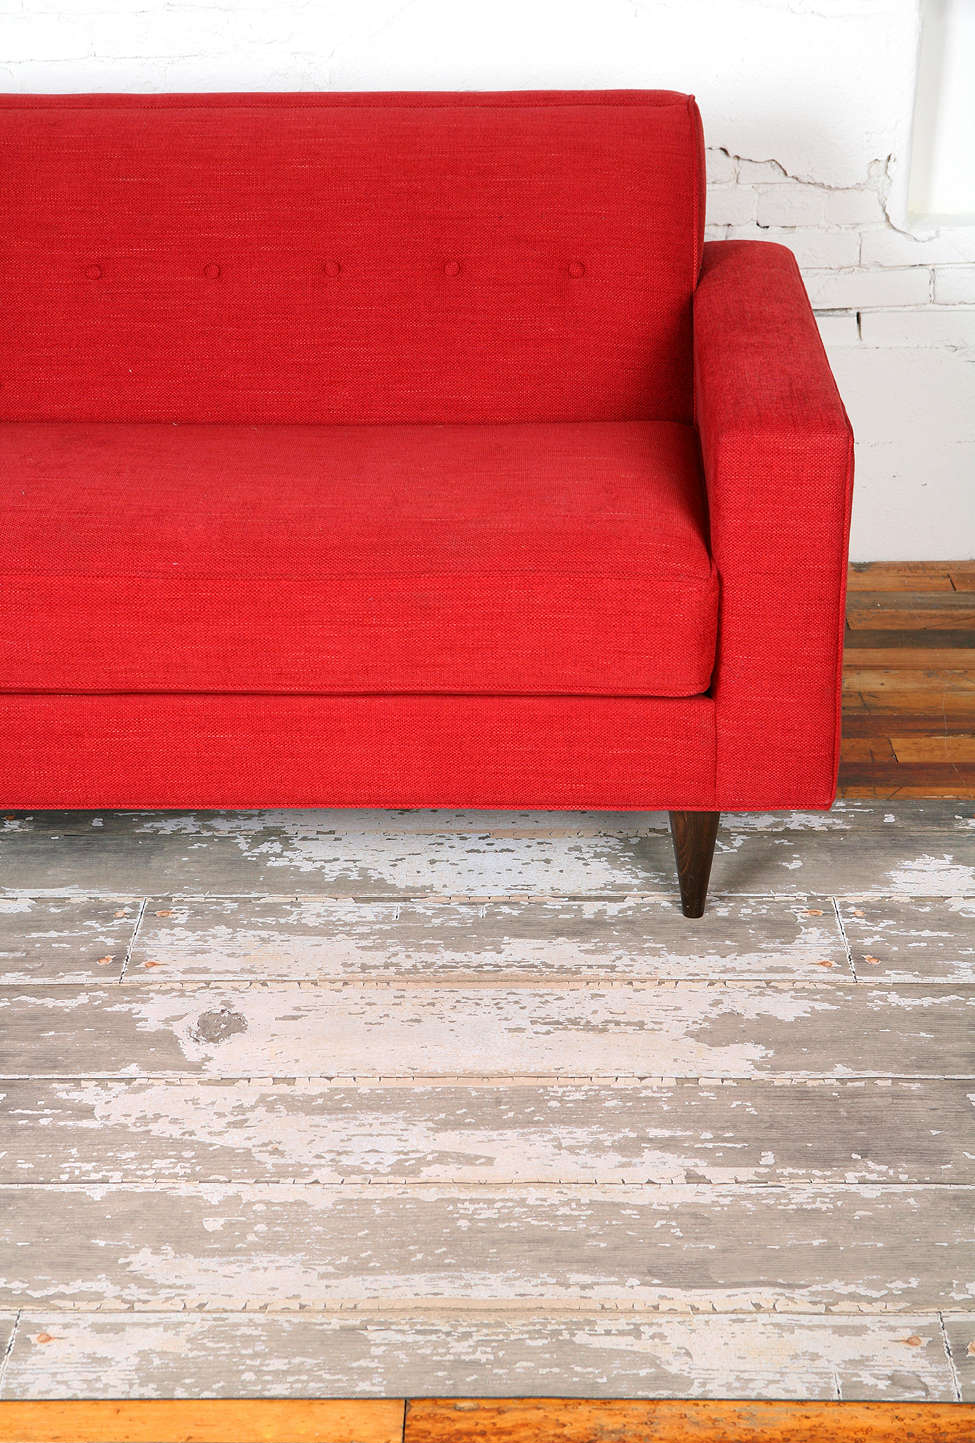 Trompe Loeil Floor Mat